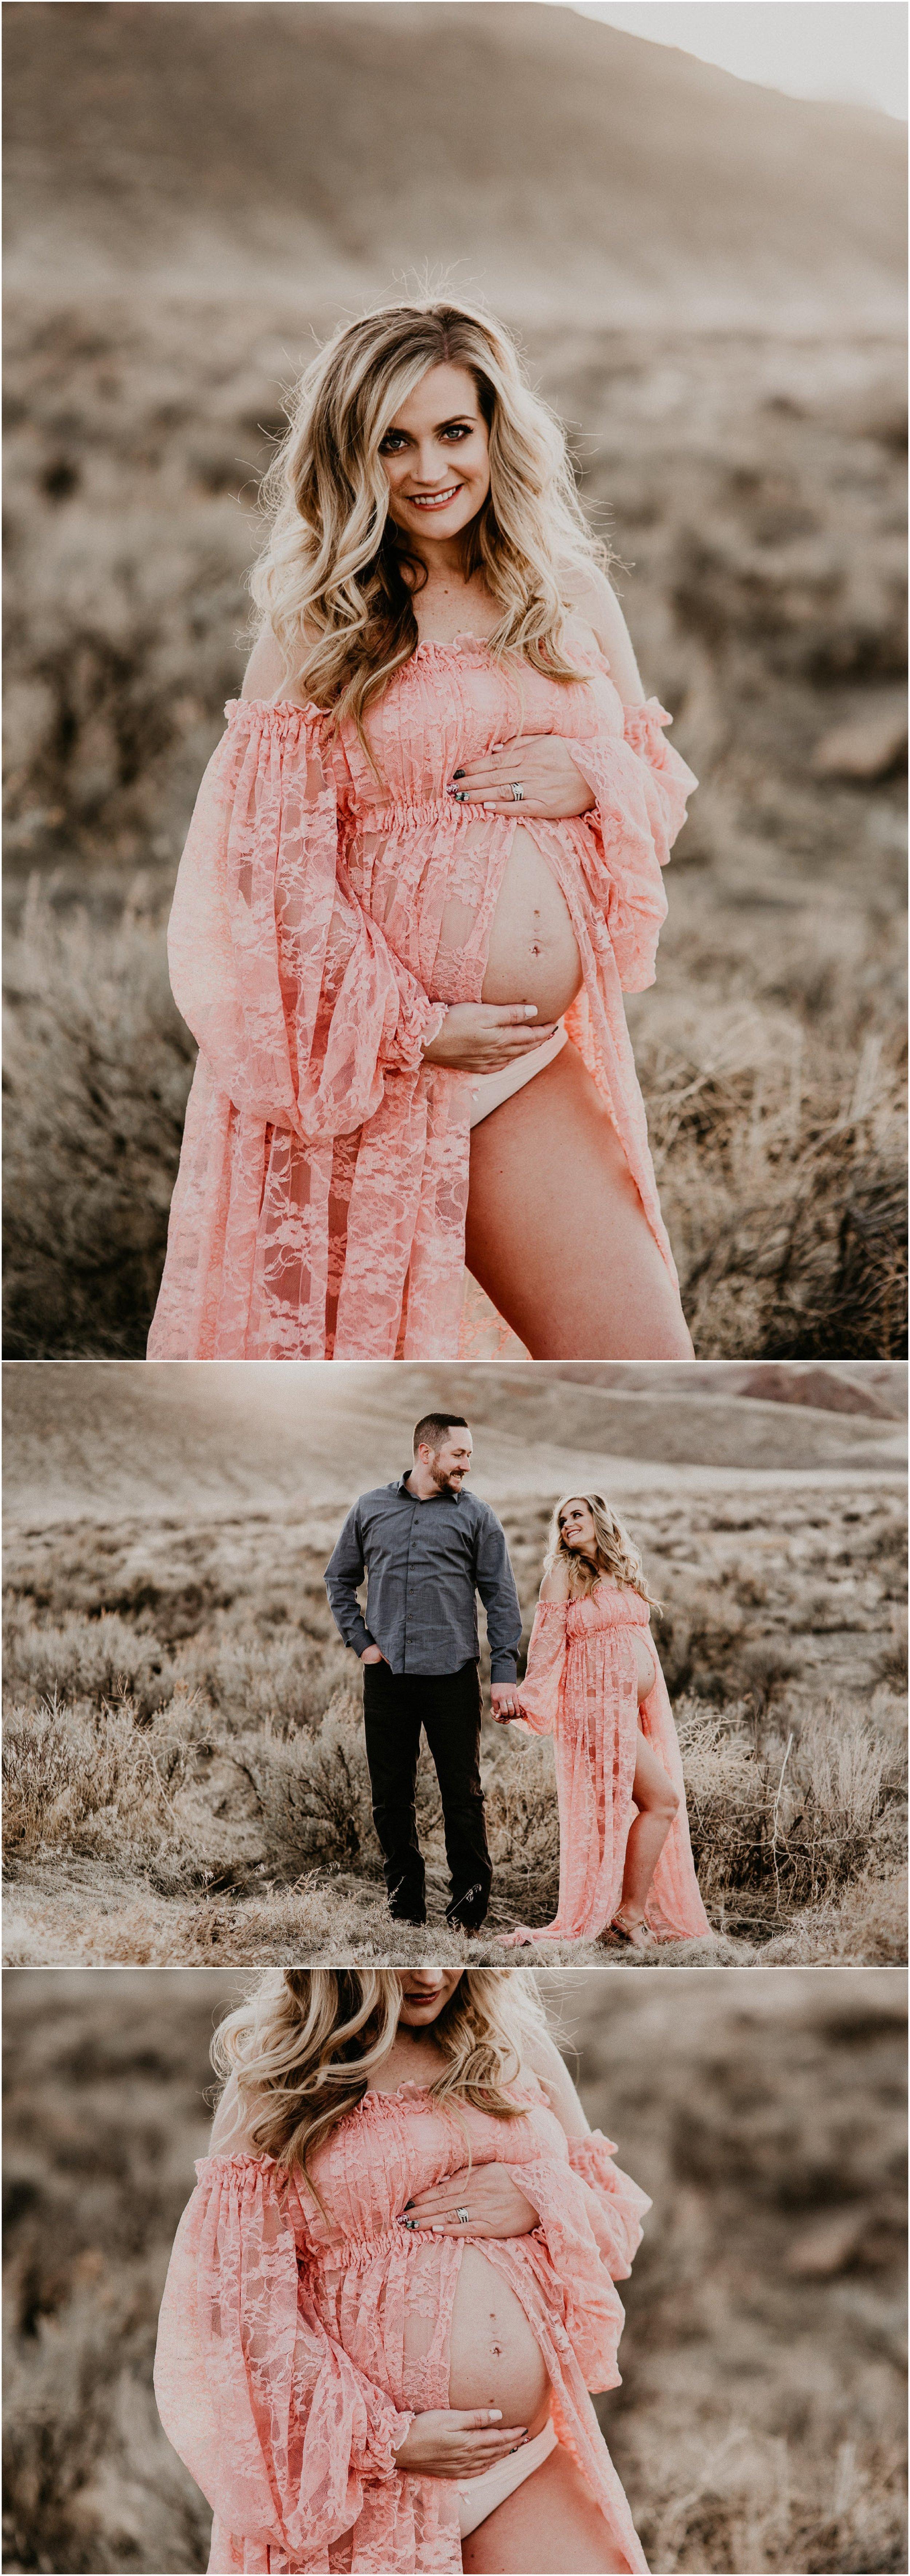 187e4ee7bc47f Boise Maternity Boudoir Photographer Makayla Madden Photography Lace Blush  Maternity Dress Sew Trendy Accessories Idaho Motherhood